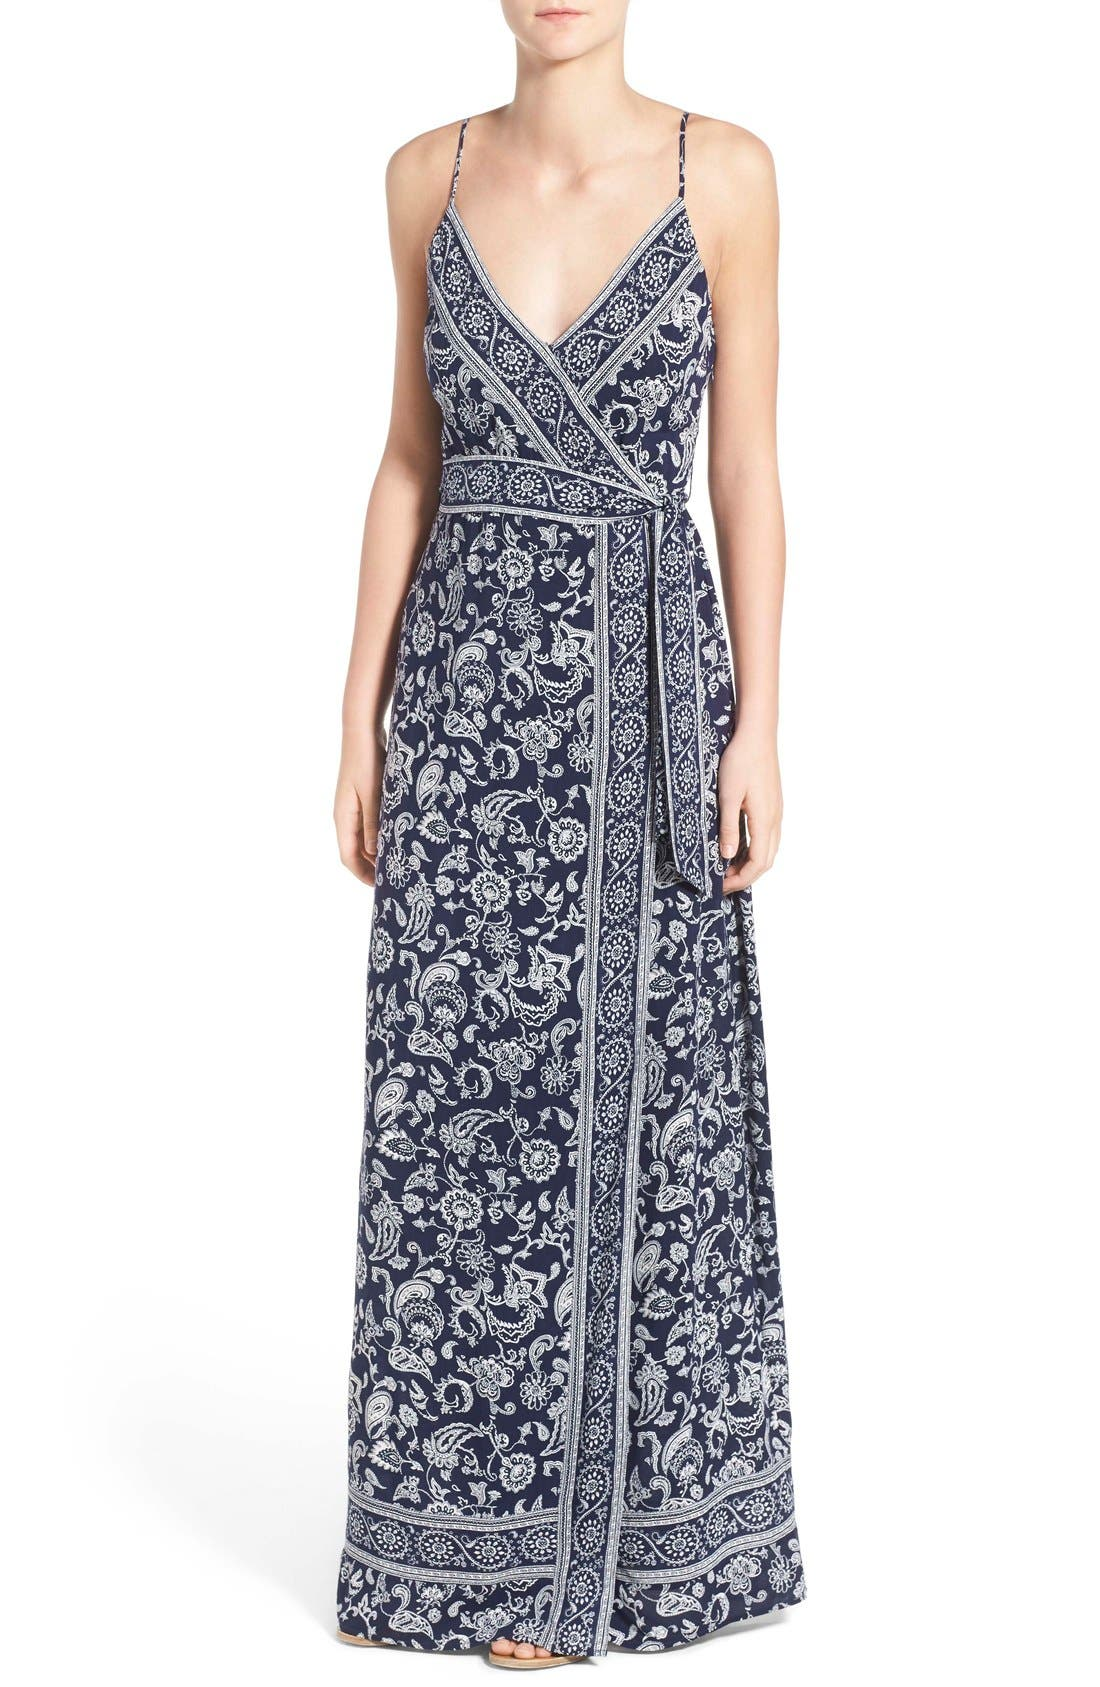 Alternate Image 1 Selected - PAIGE 'Regina' Print Maxi Surplice Dress